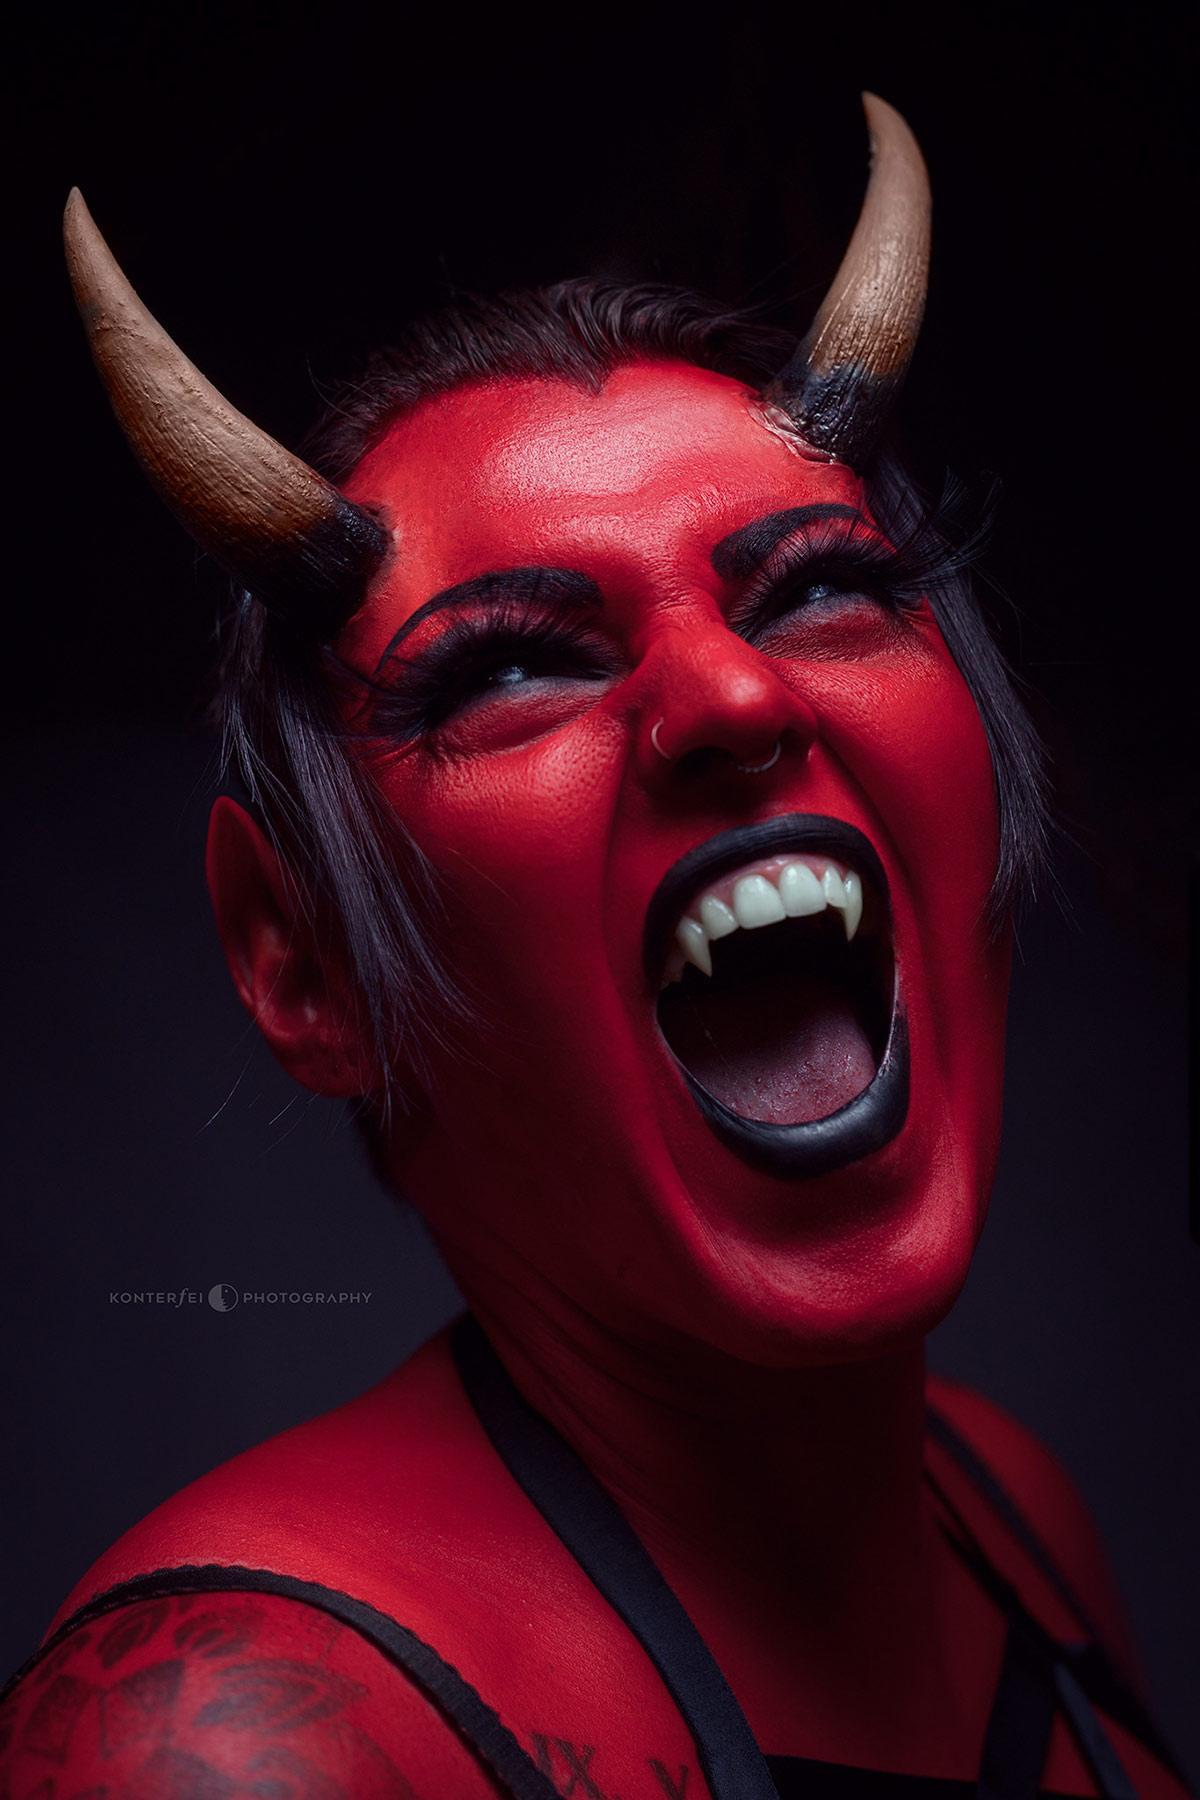 Scream from Hell | Dark Beauty | Photography